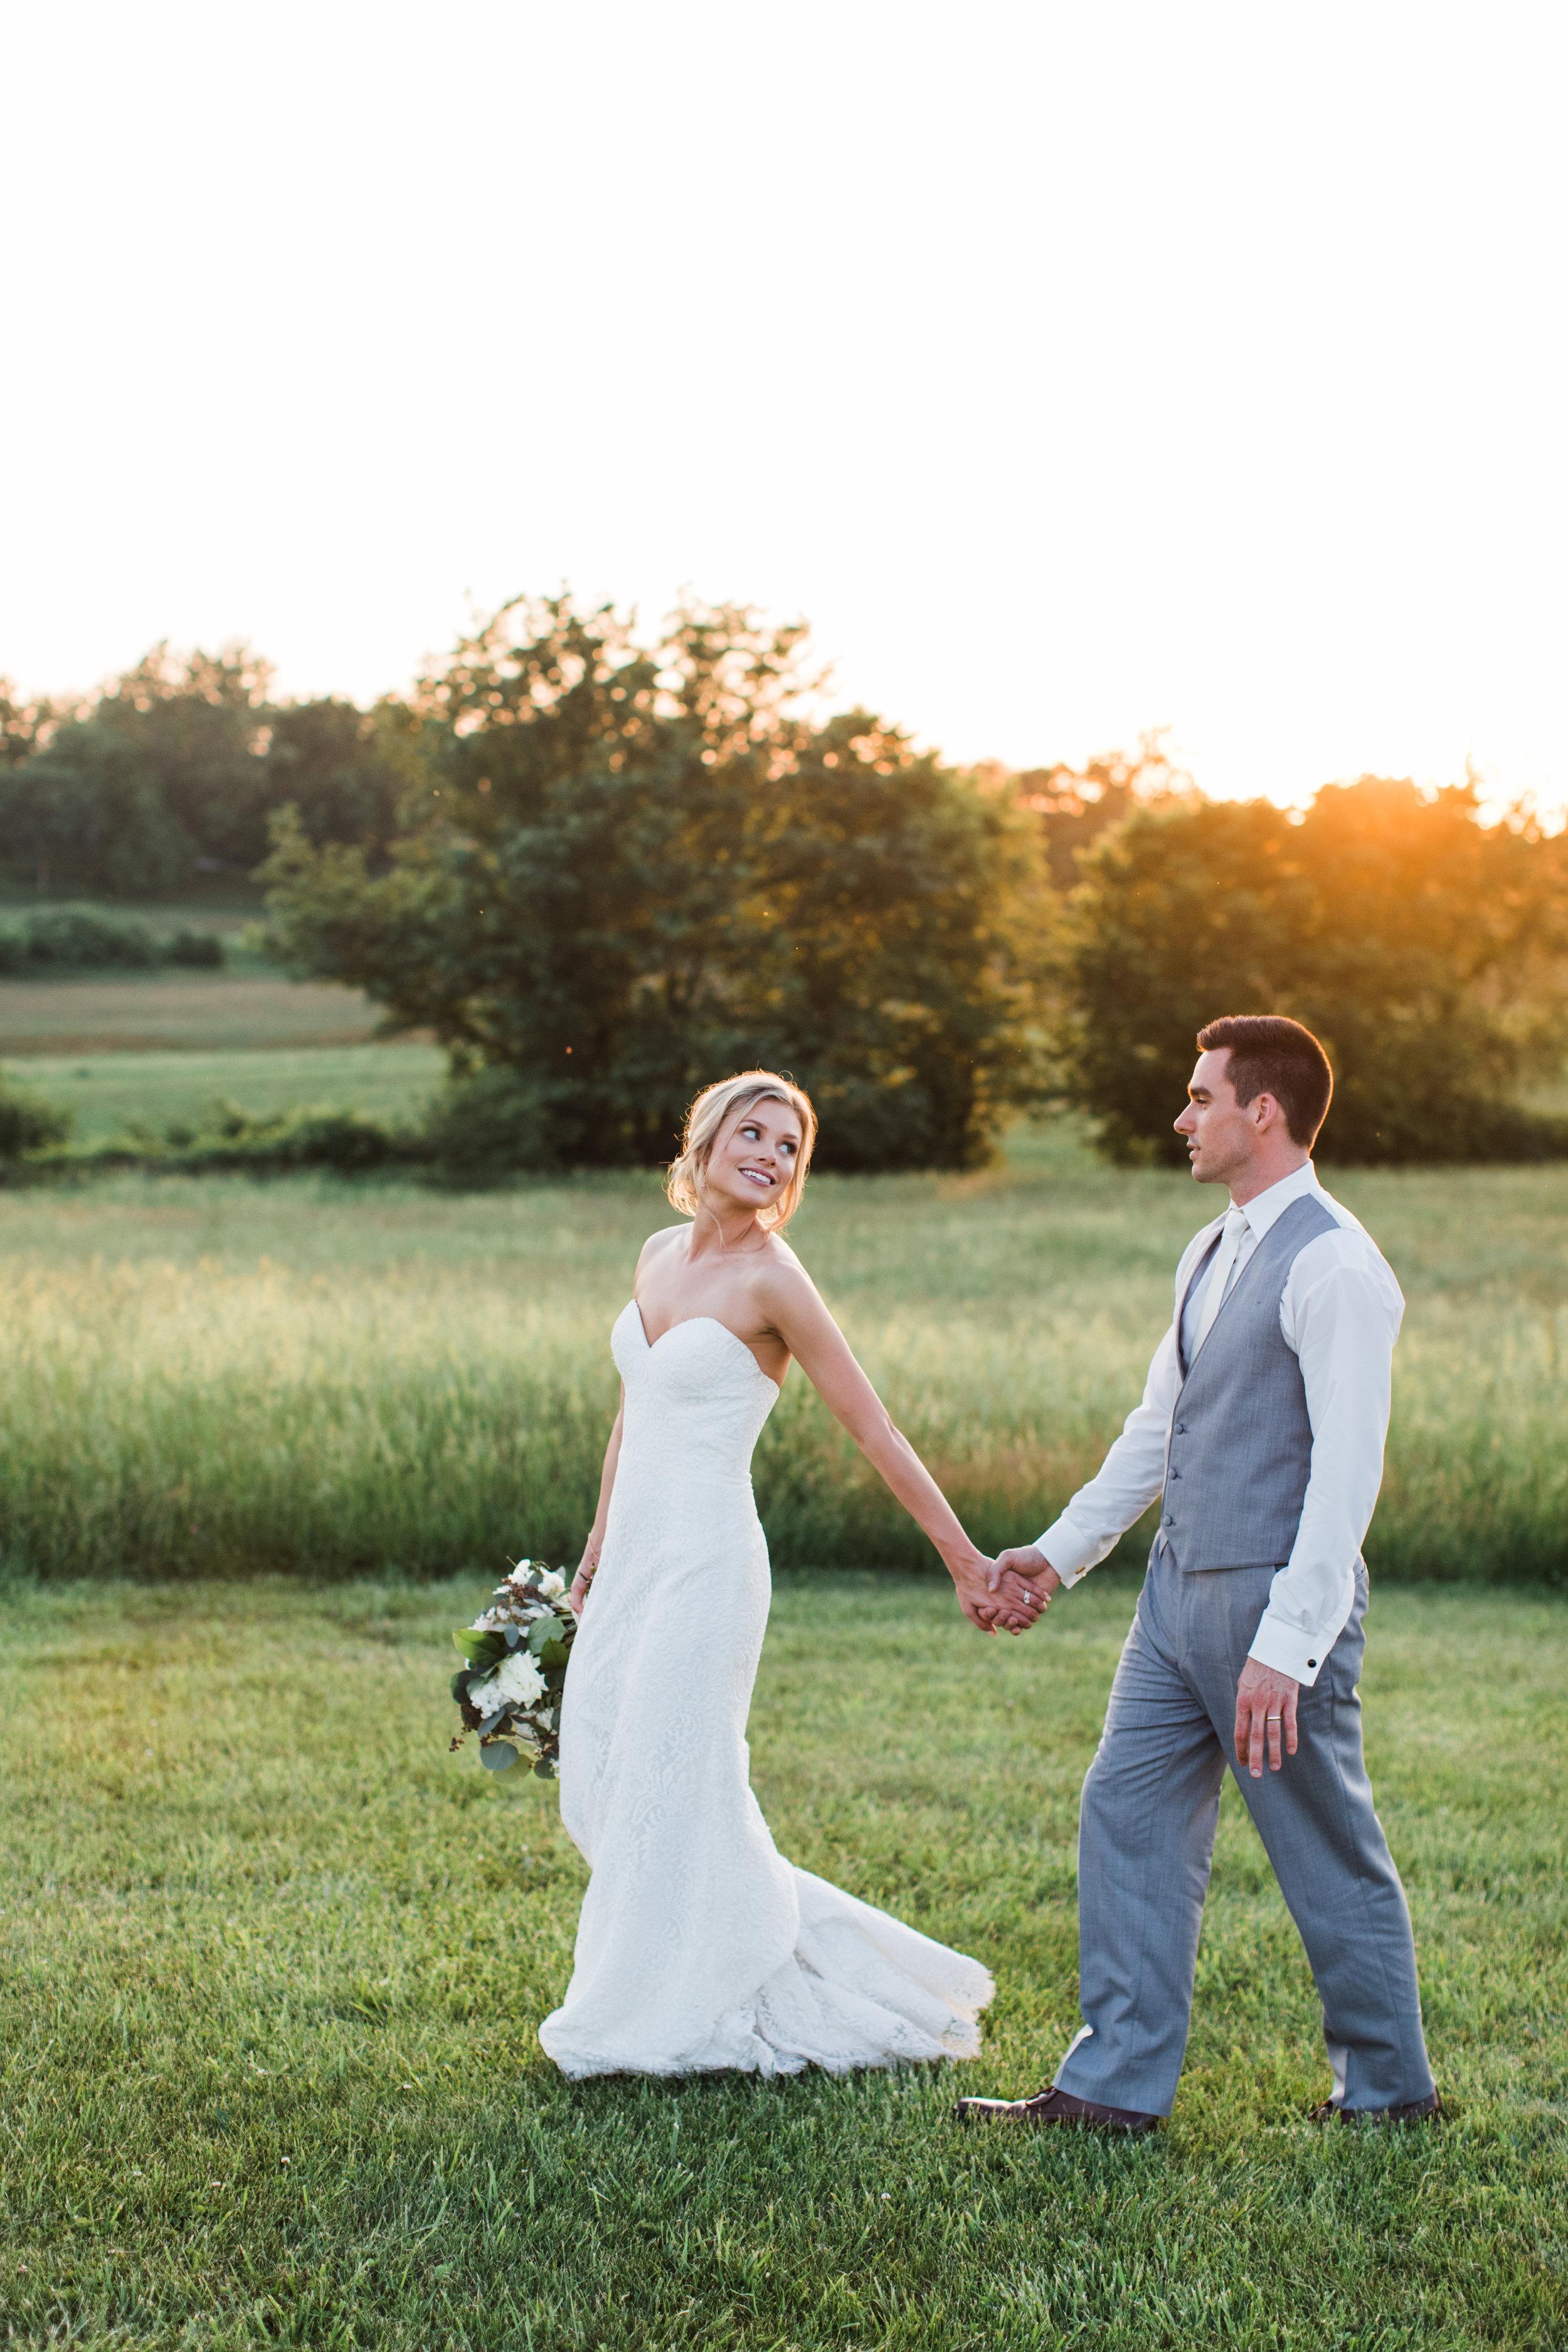 RHODES WEDDING - MARISSA CRIBBS PHOTOGRAPHY-1099.jpg